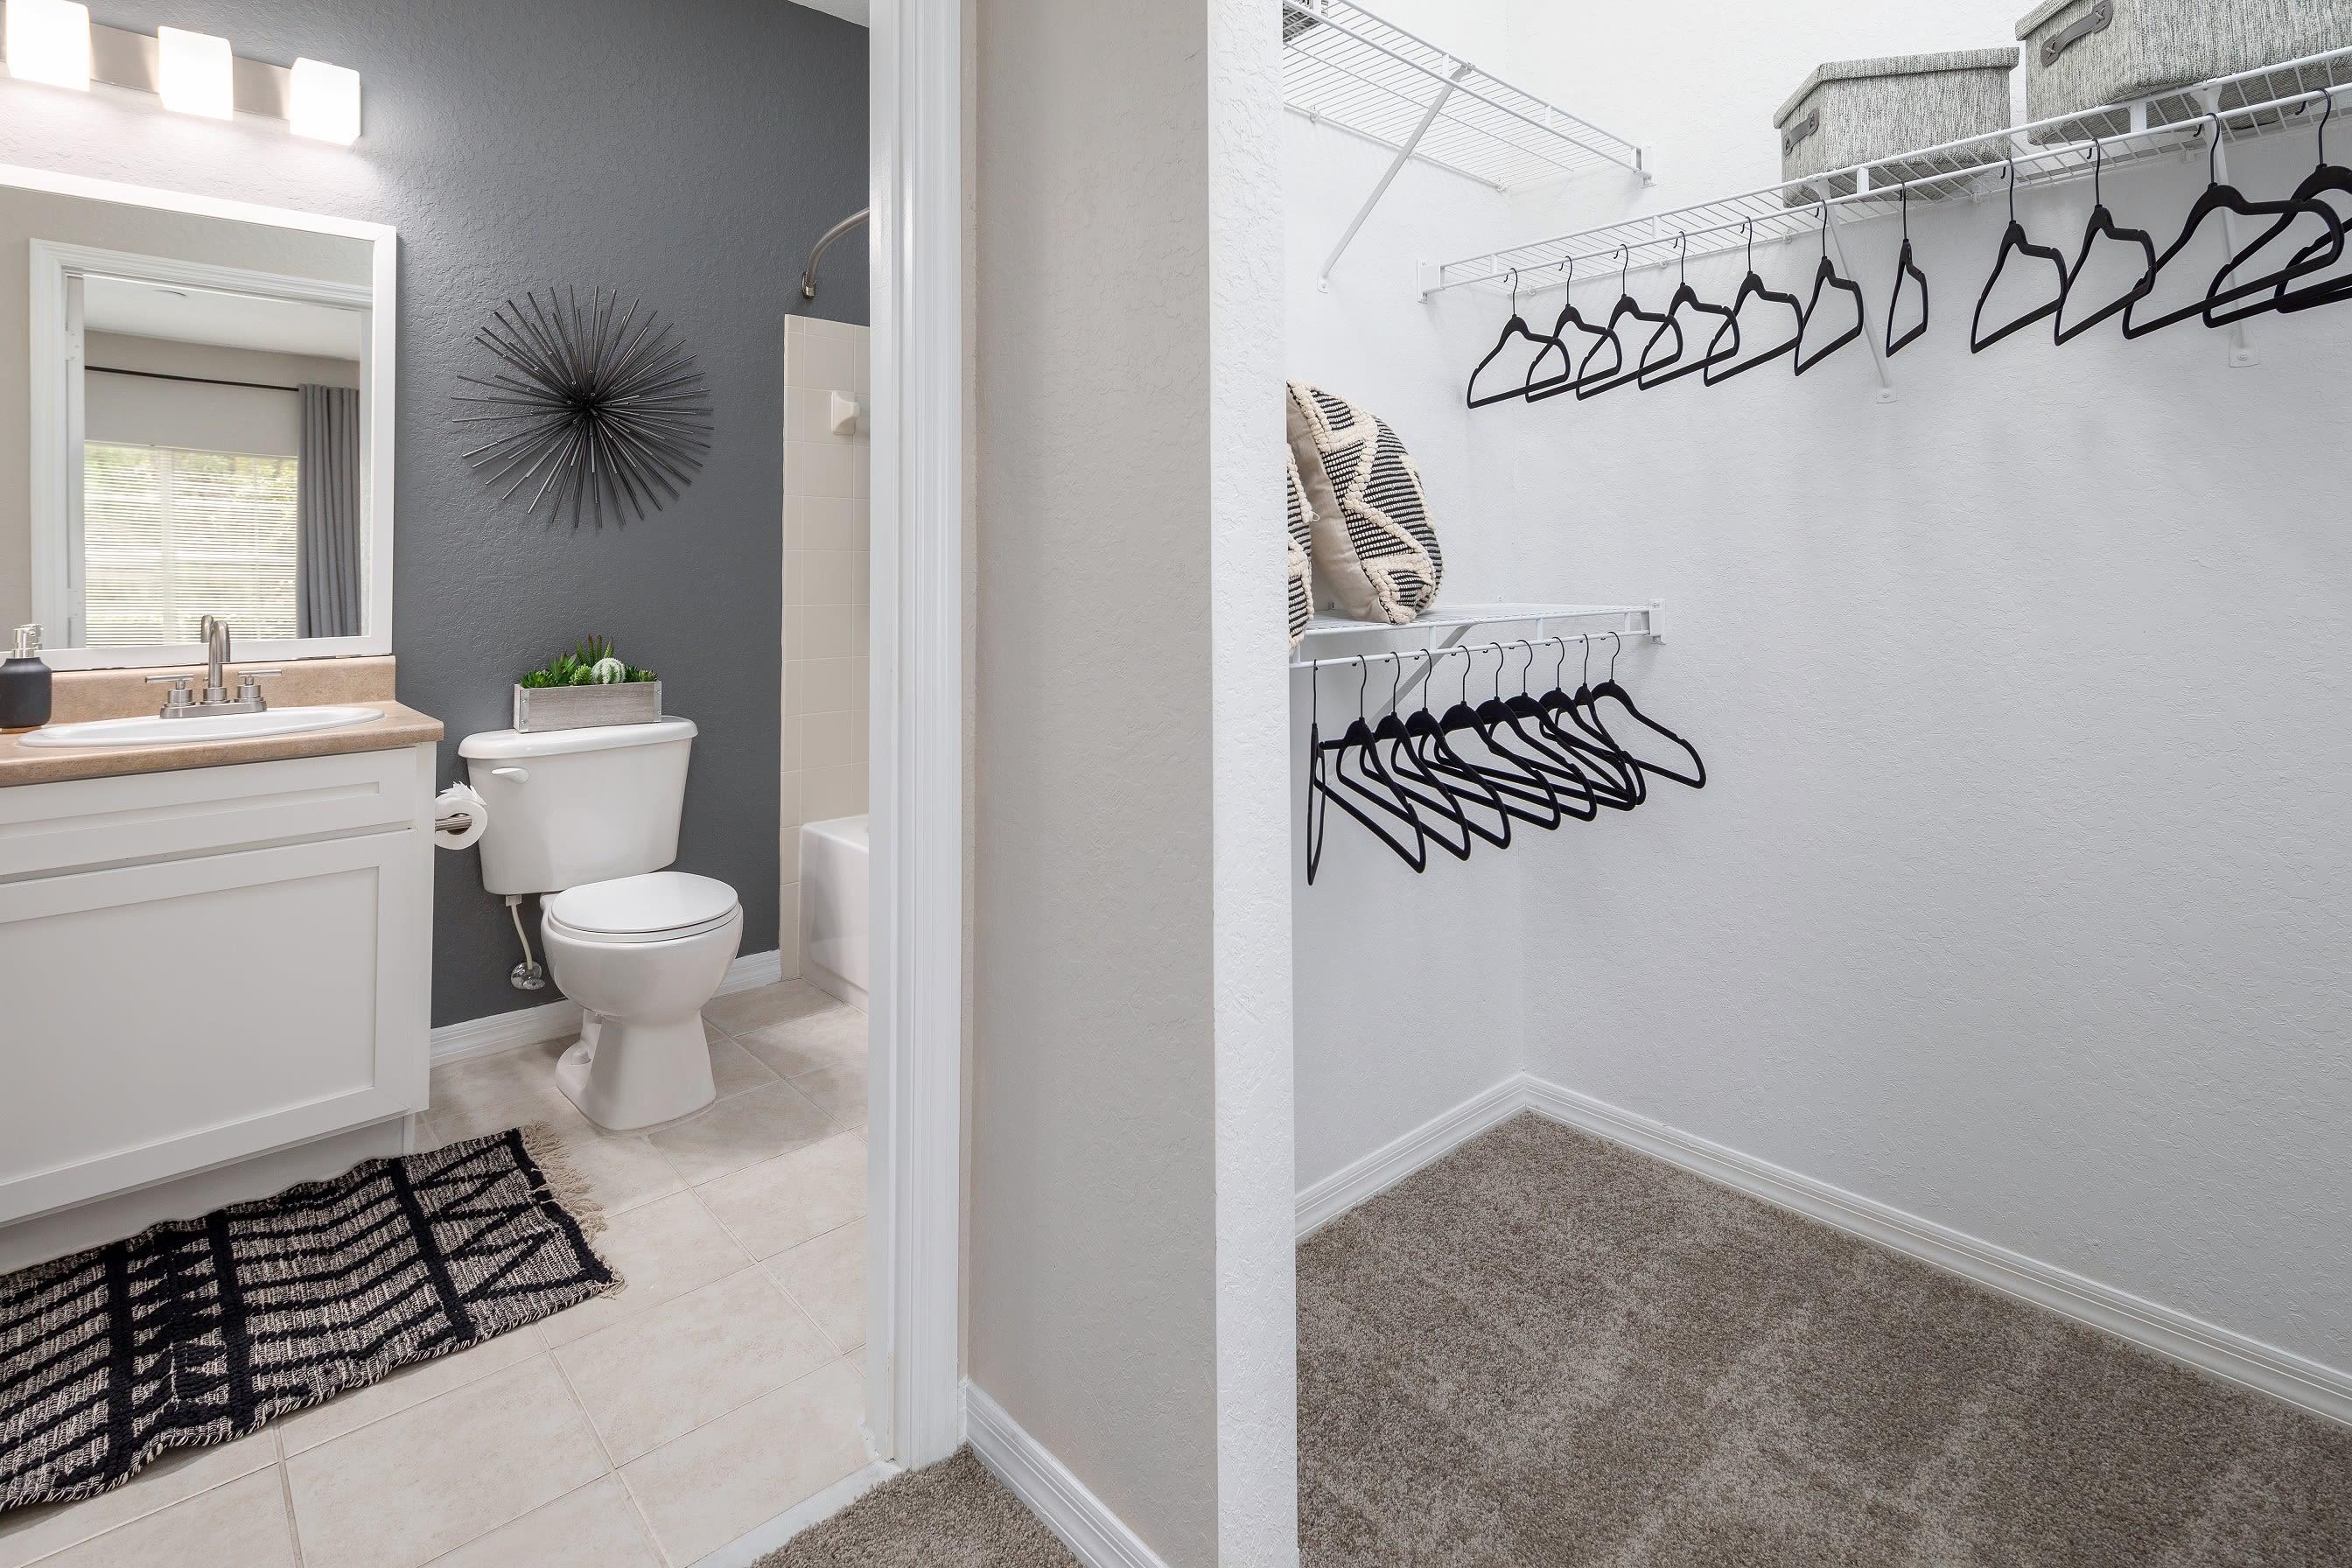 Walk in closet next to main bathroom at Mezza in Jacksonville, Florida